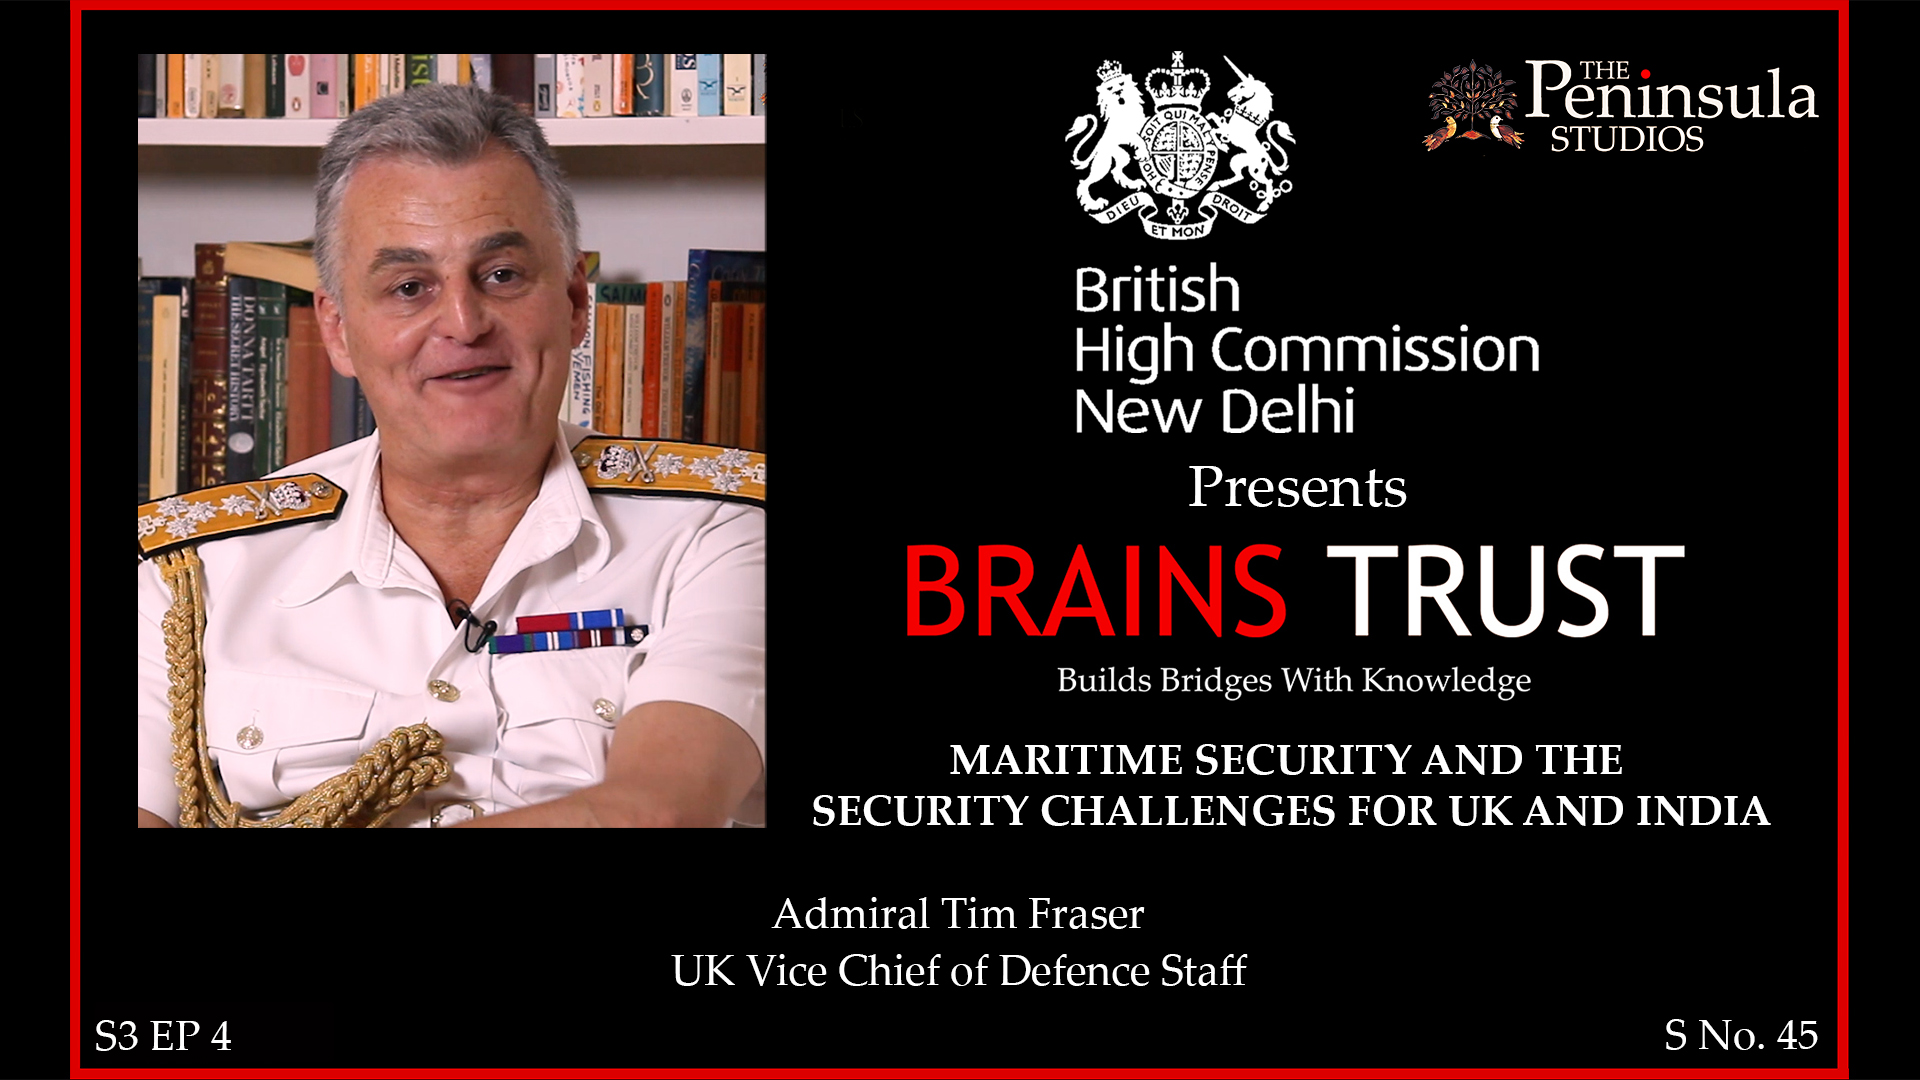 Admiral Tim Fraser